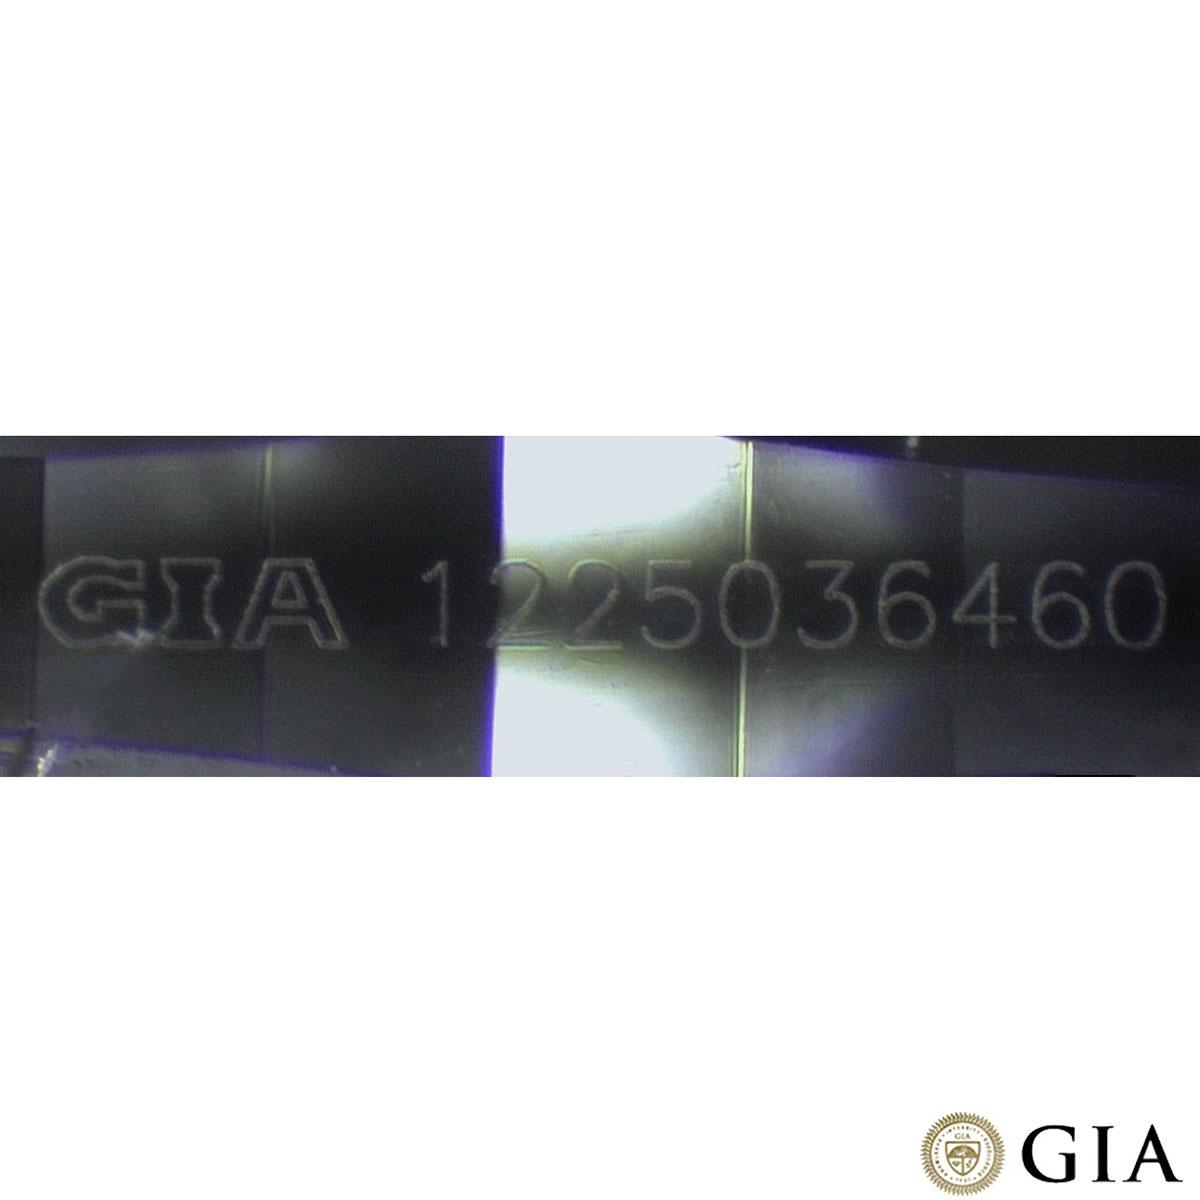 White Gold Round Brilliant Cut Diamond Ring 1.52ct G/VVS2